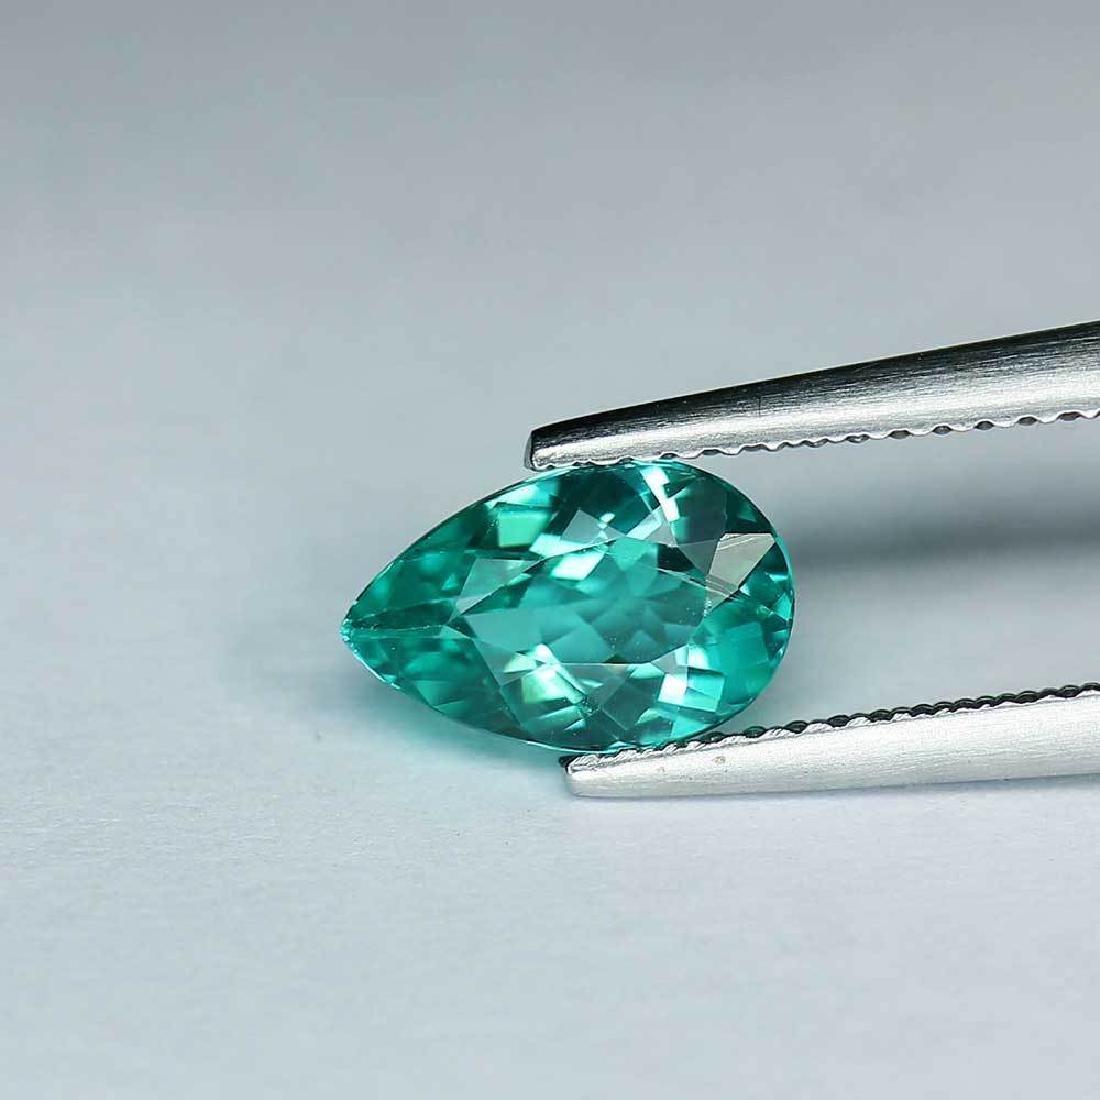 1.35 ct paraiba blue apatite